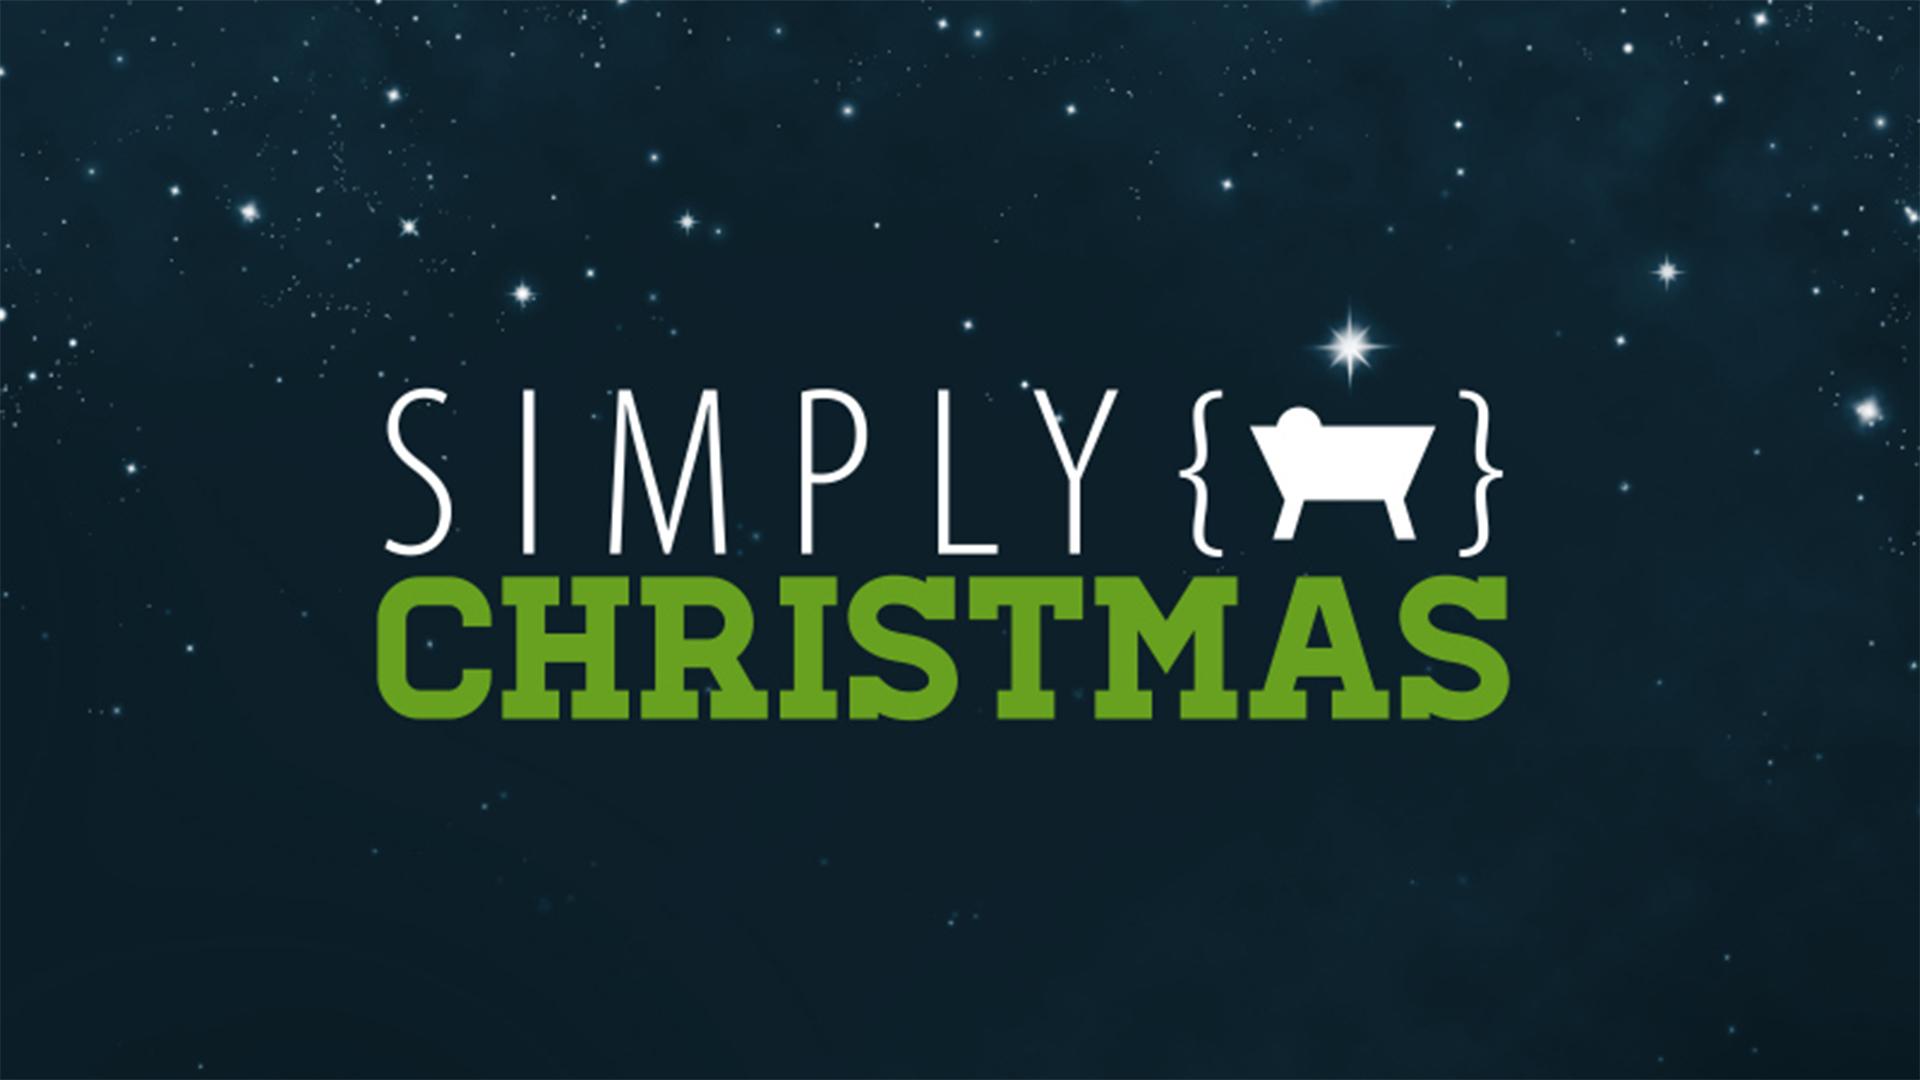 Simply Christmas Graphic.jpg